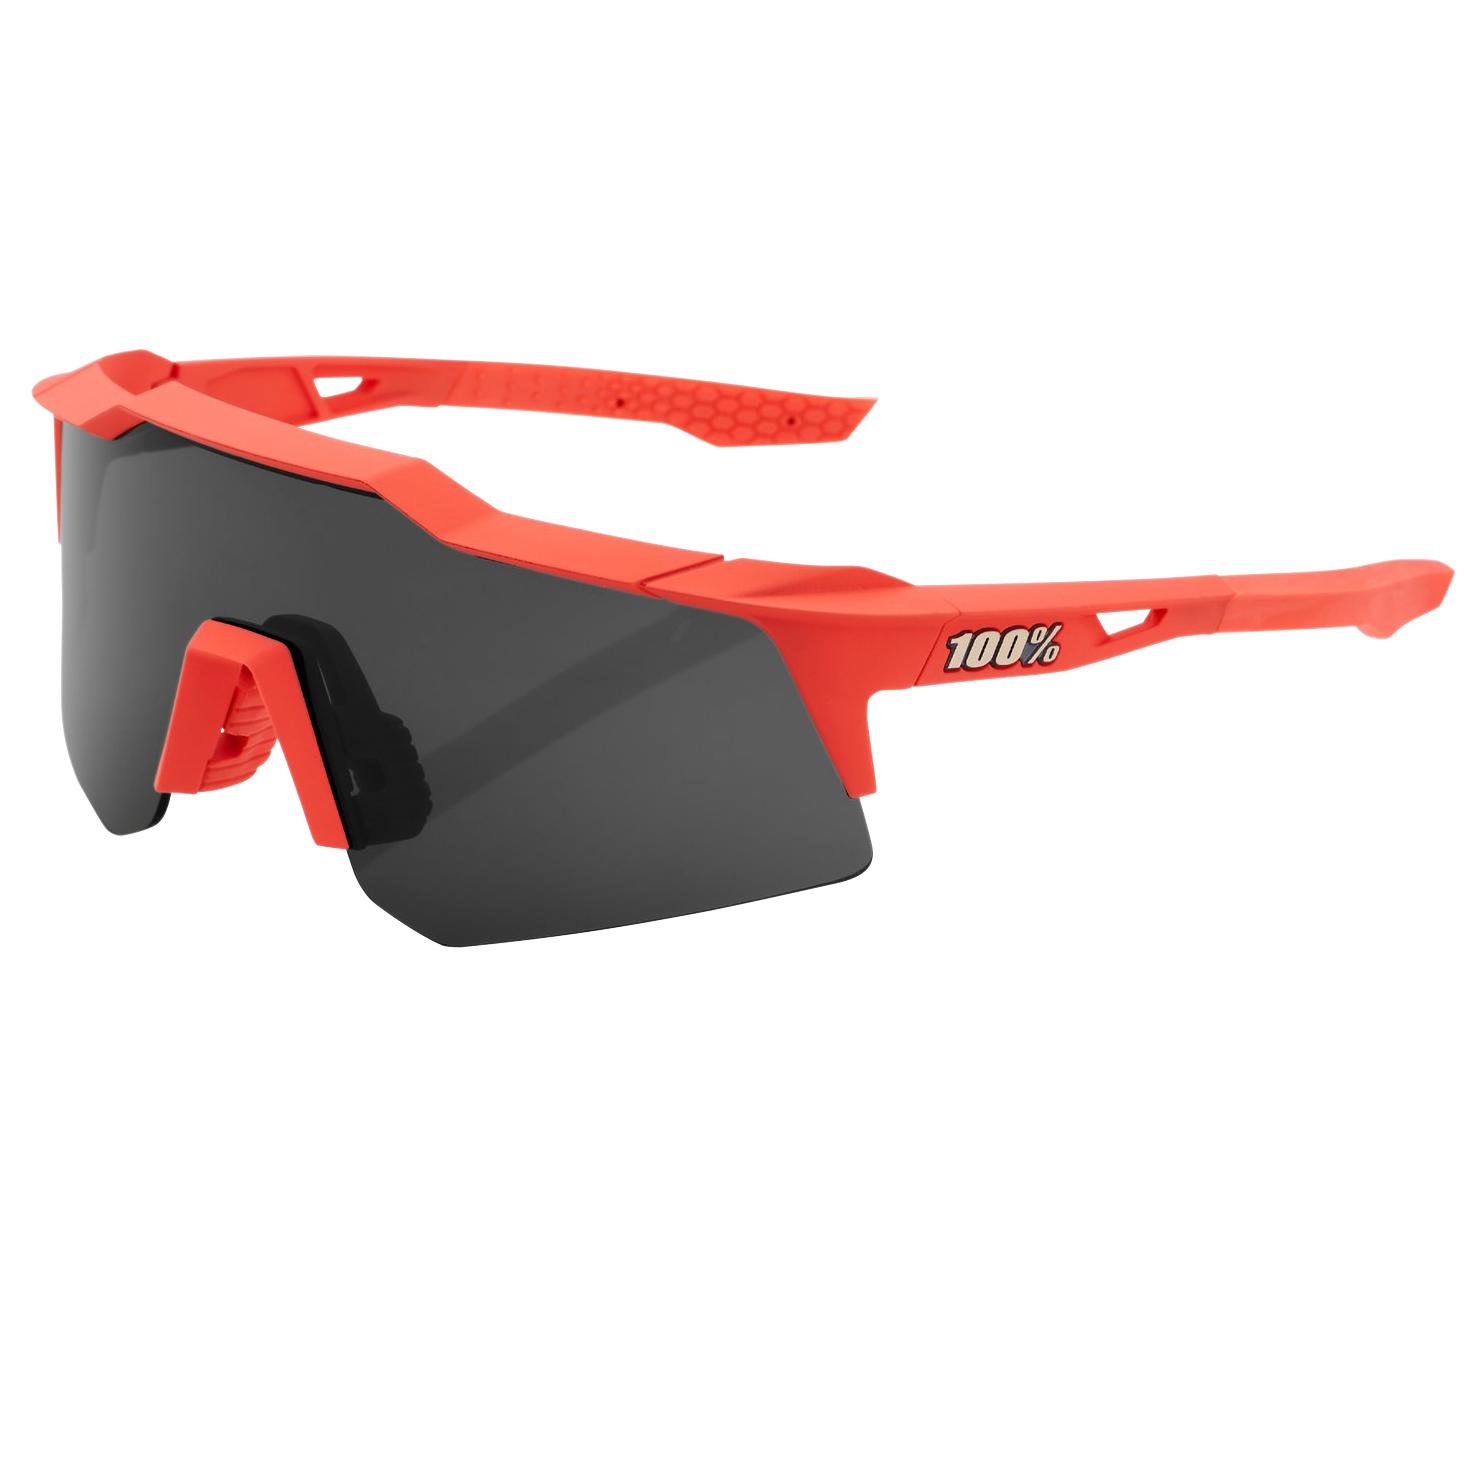 100% Speedcraft - XS - Gafas - Soft Tact Coral/Smoke + Clear